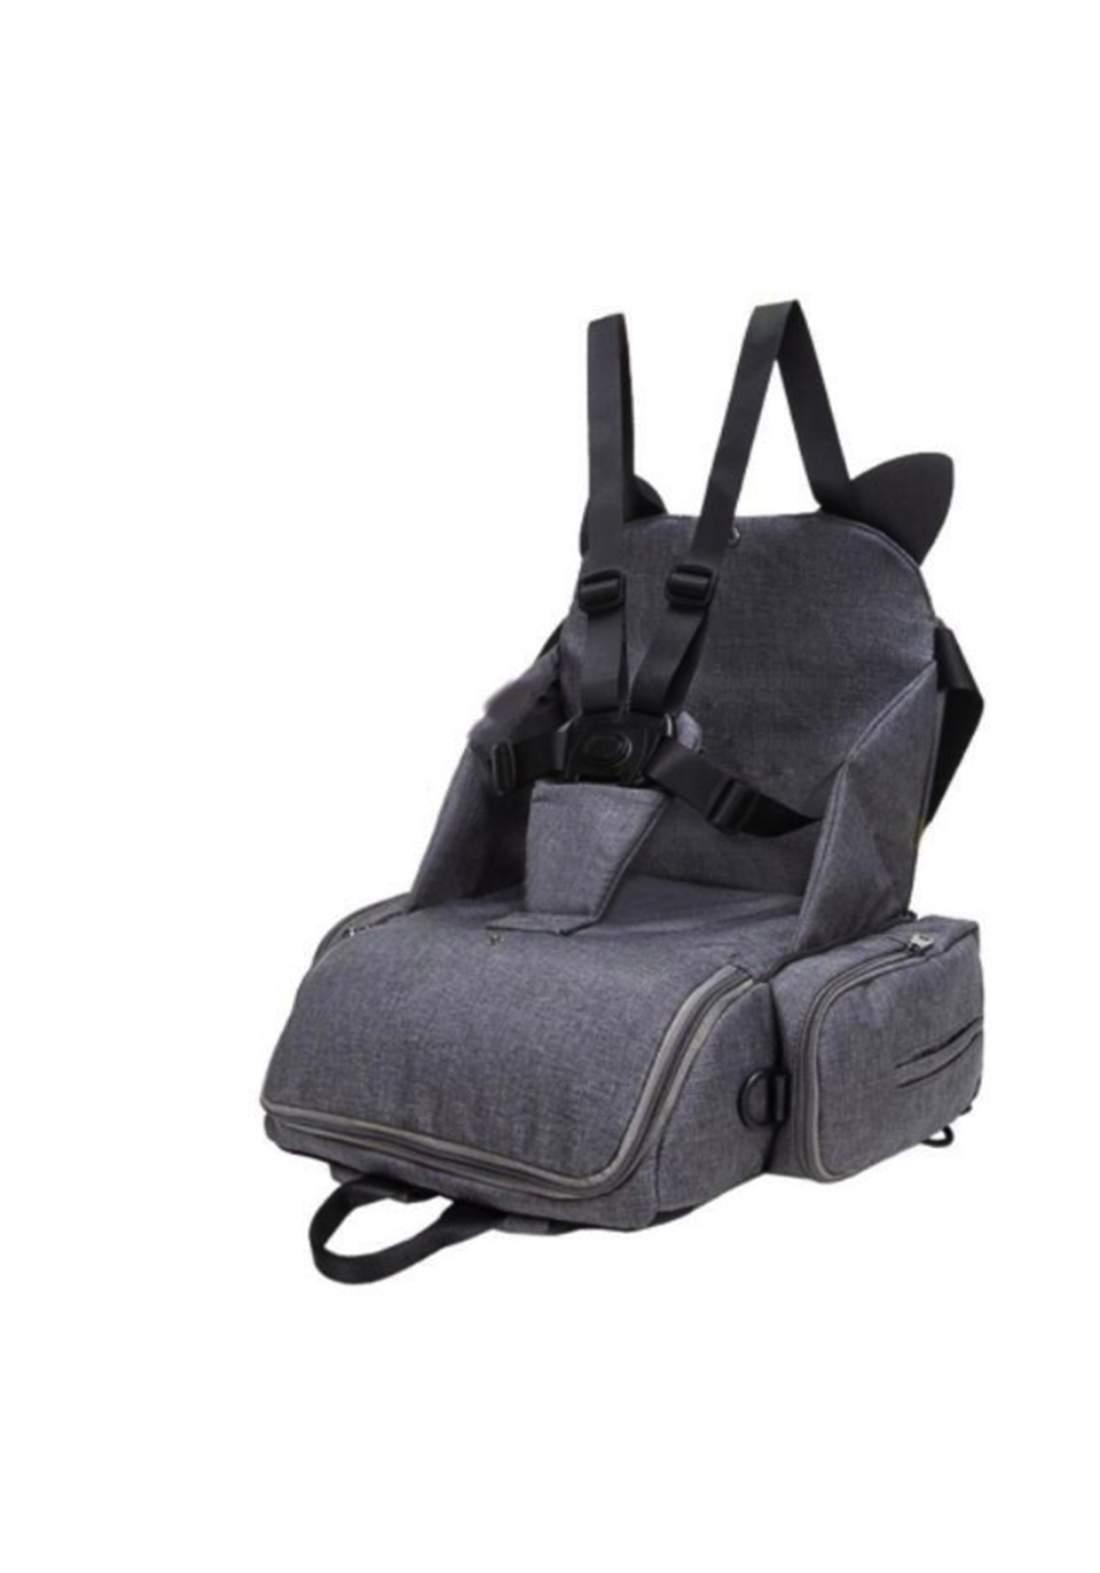 Yookee 2 In 1 Bag & Chair CB001  كرسي وحقيبة